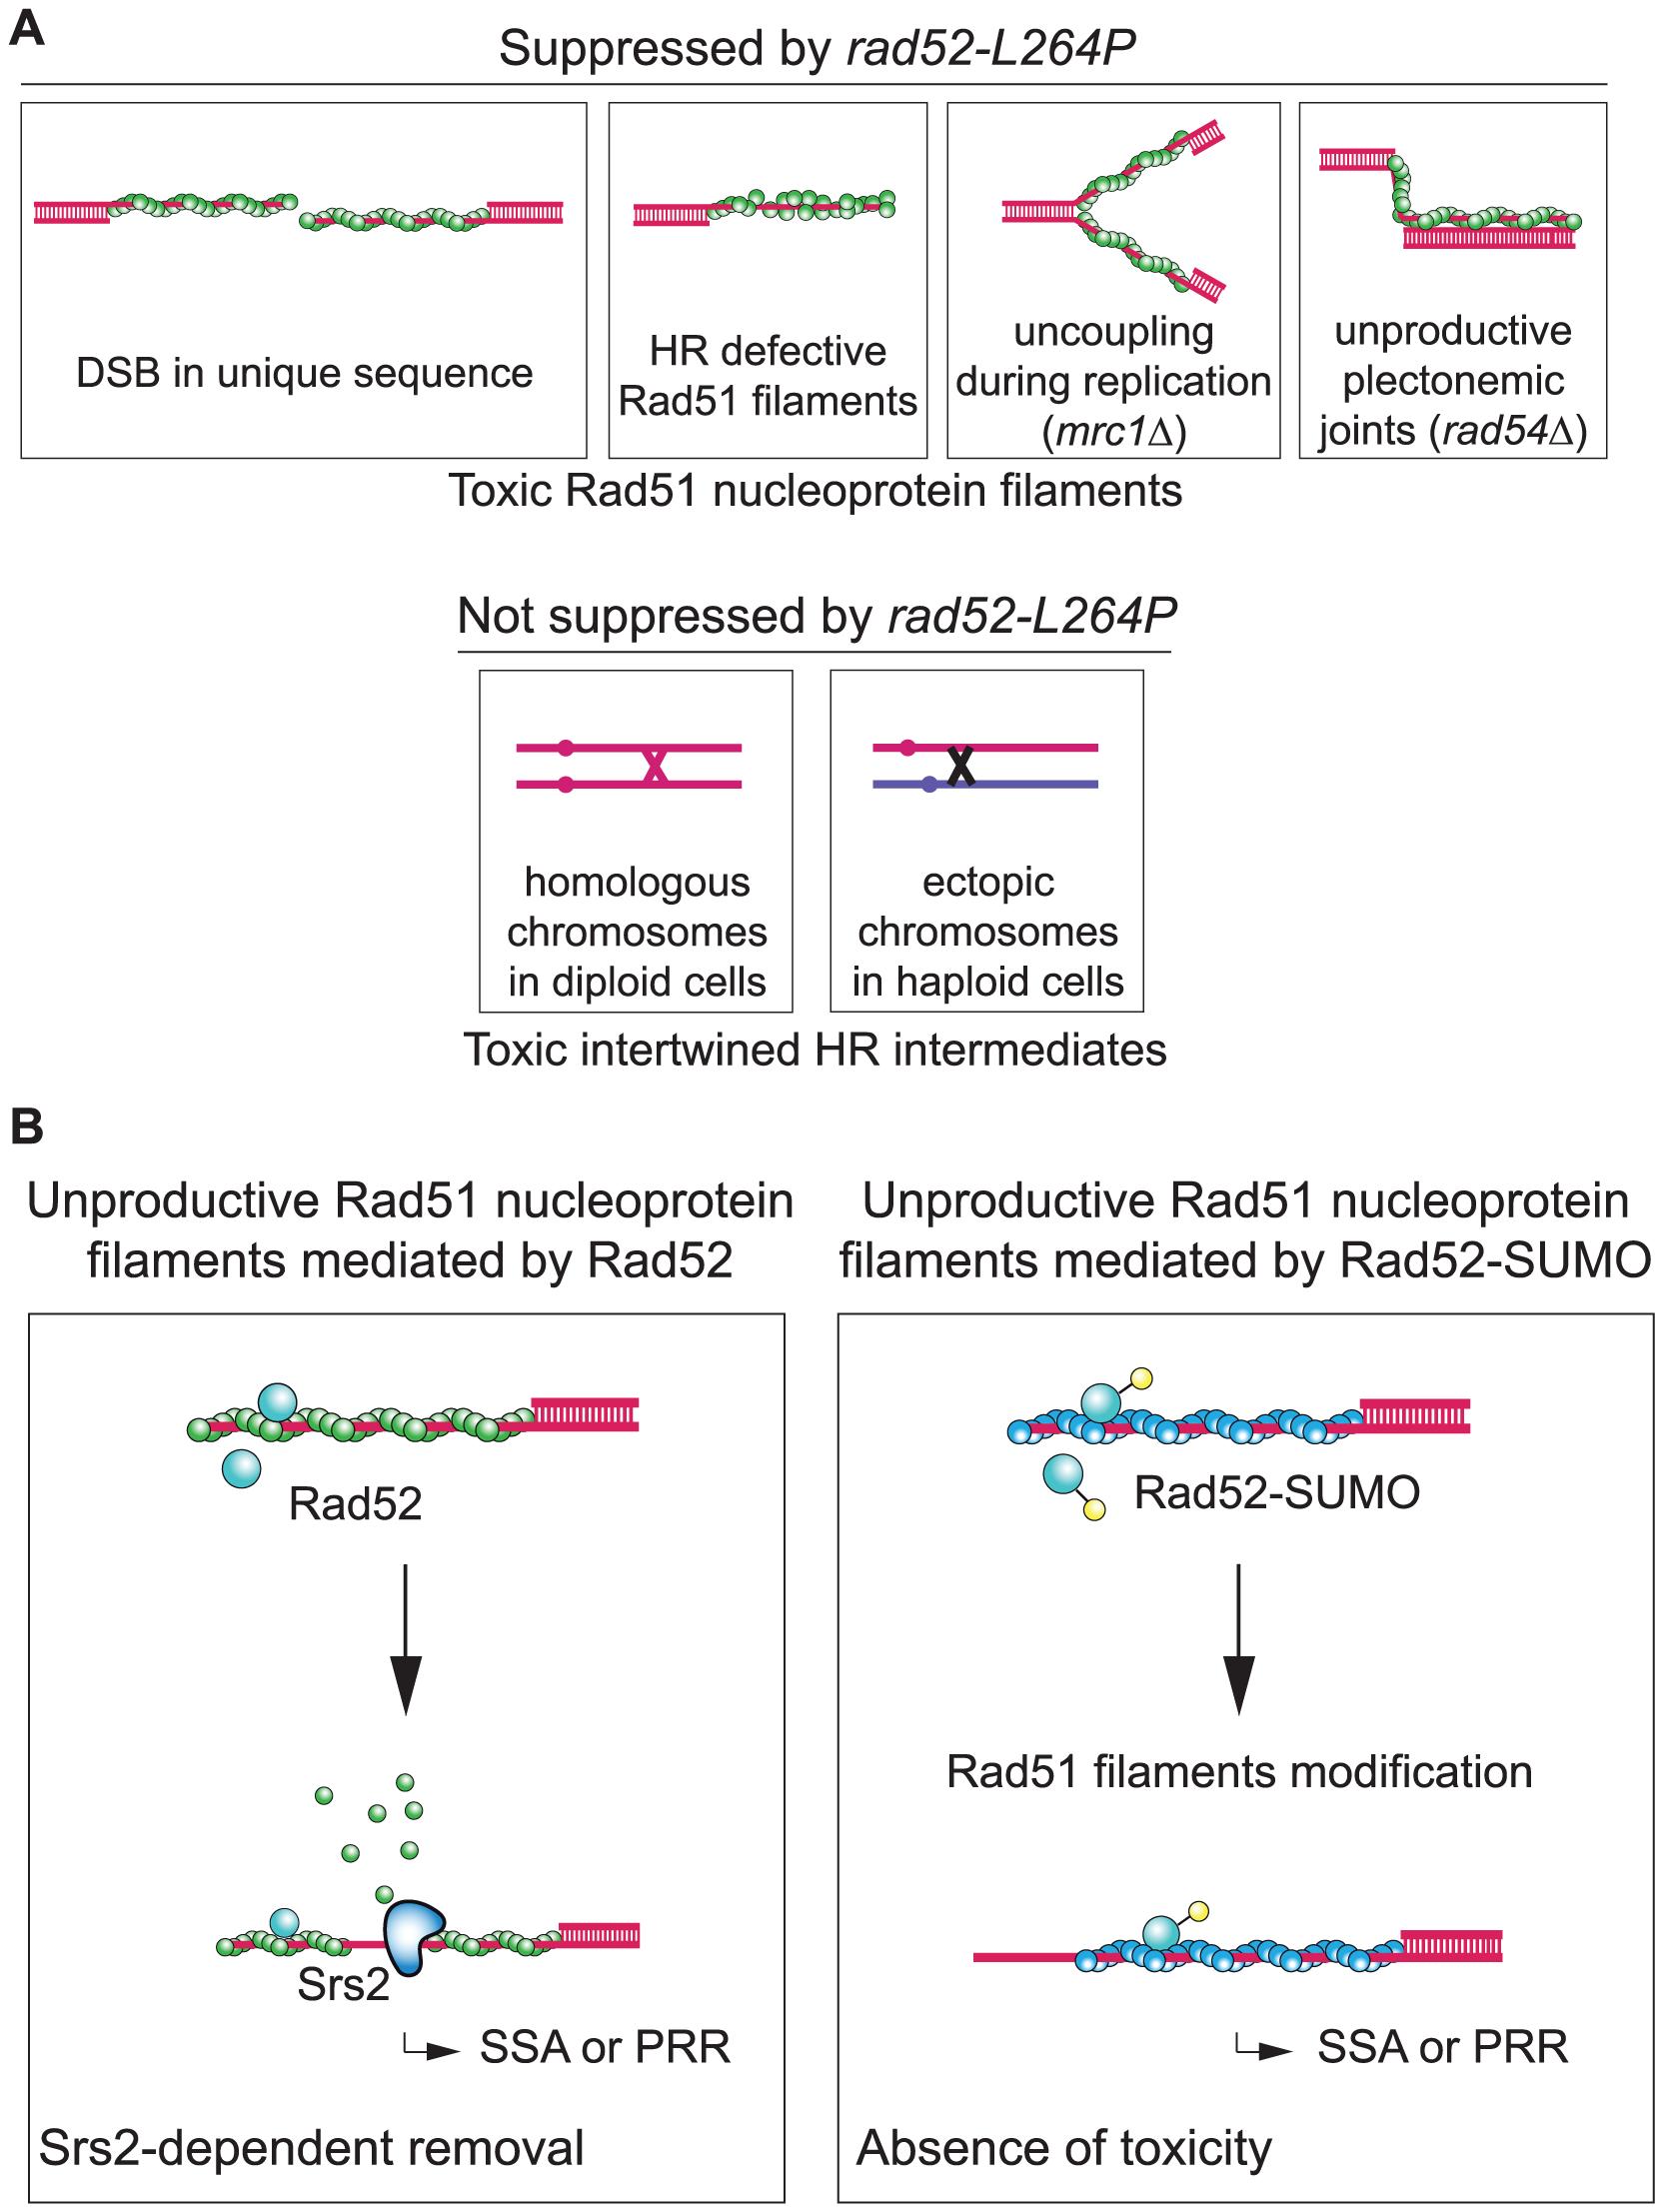 Rad52 sumoylation prevents the toxicity of unproductive Rad51 filaments.